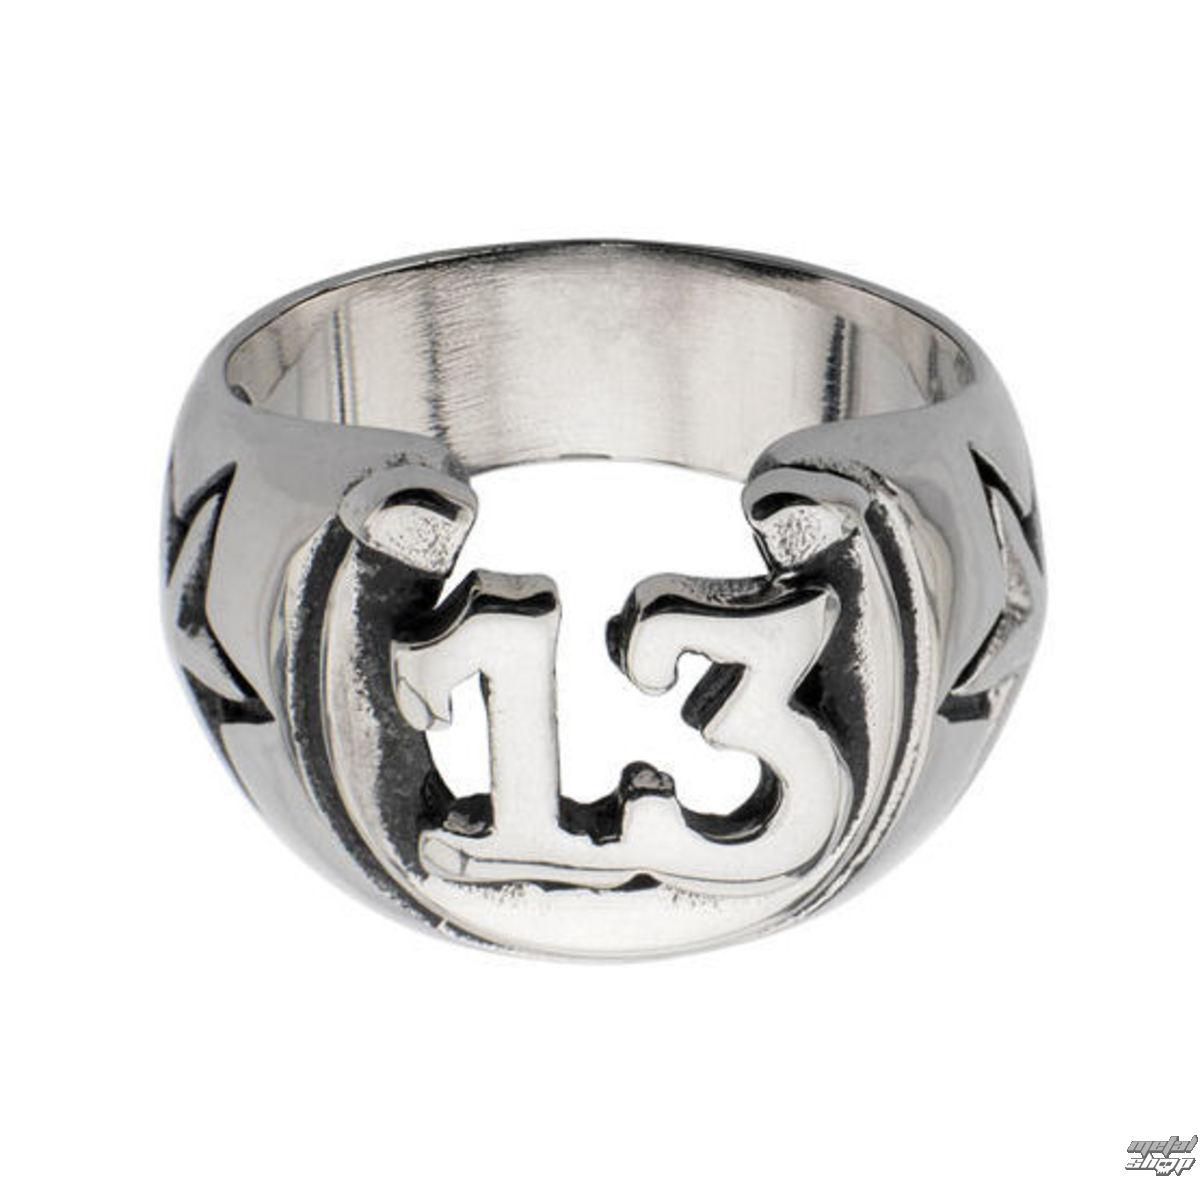 prsteň INOX - BLK LCKY13 HORSHOE - FR684